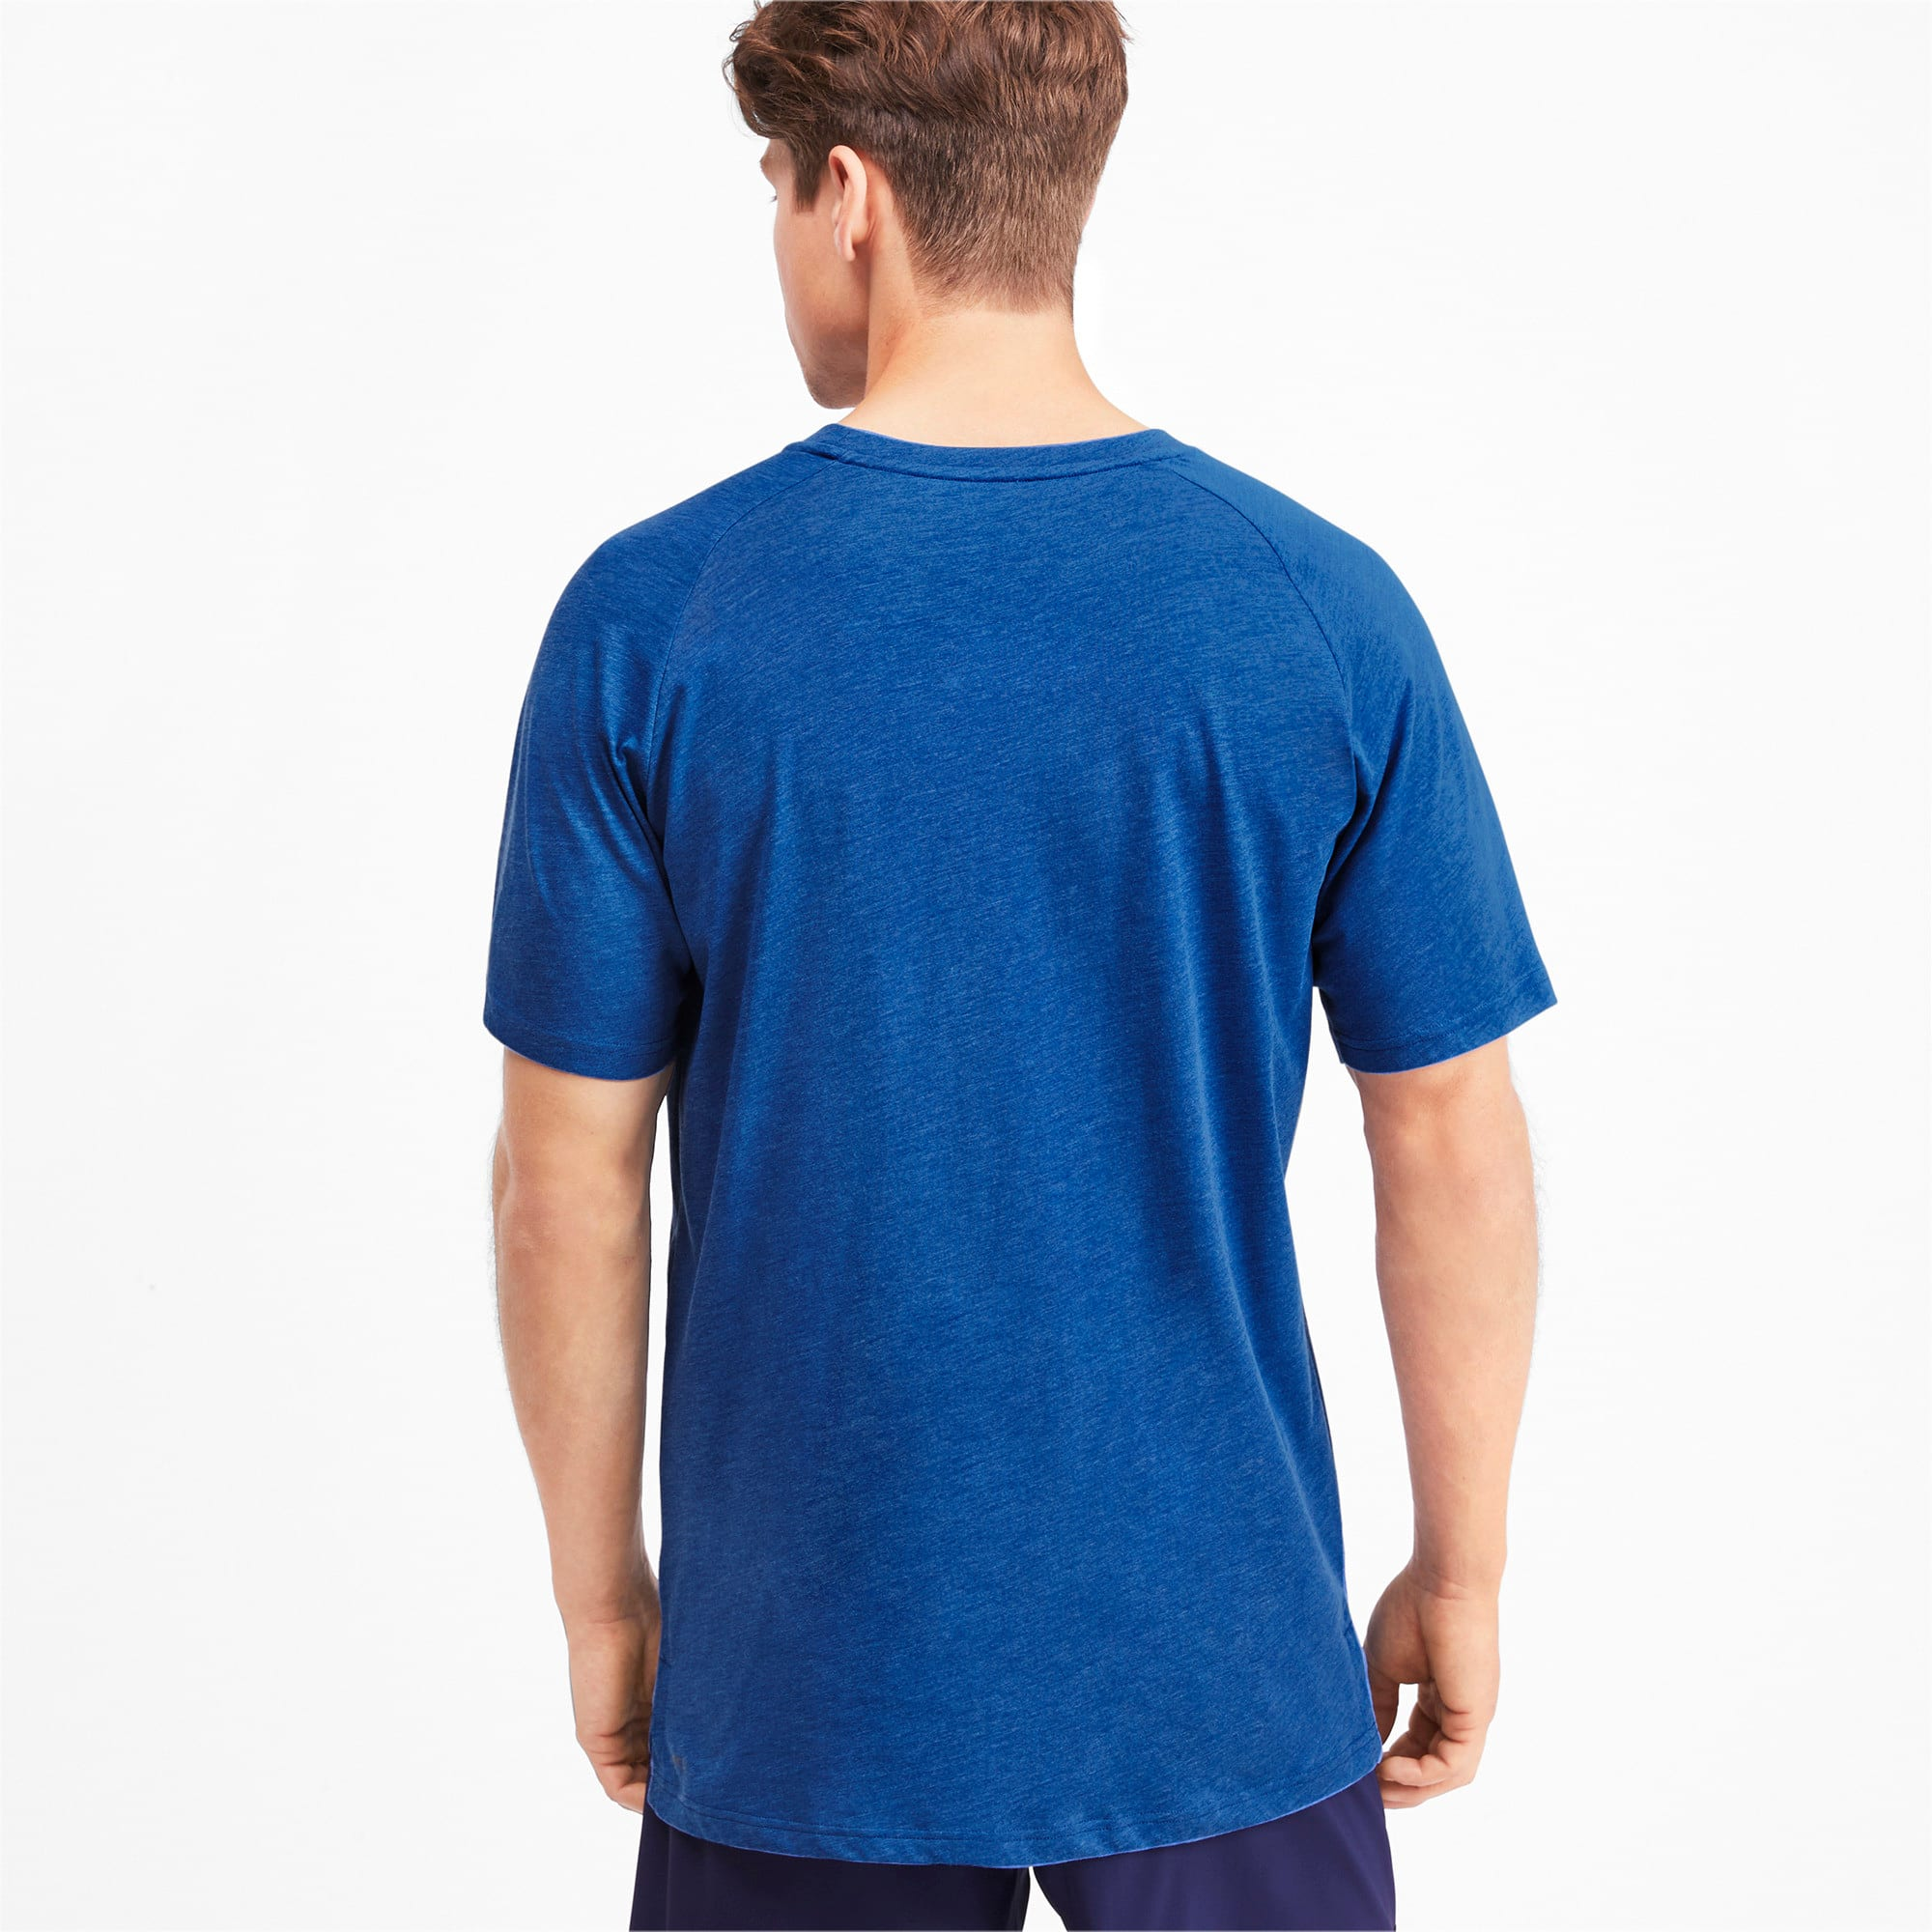 Thumbnail 2 of T-Shirt Reactive pour homme, Galaxy Blue Heather, medium